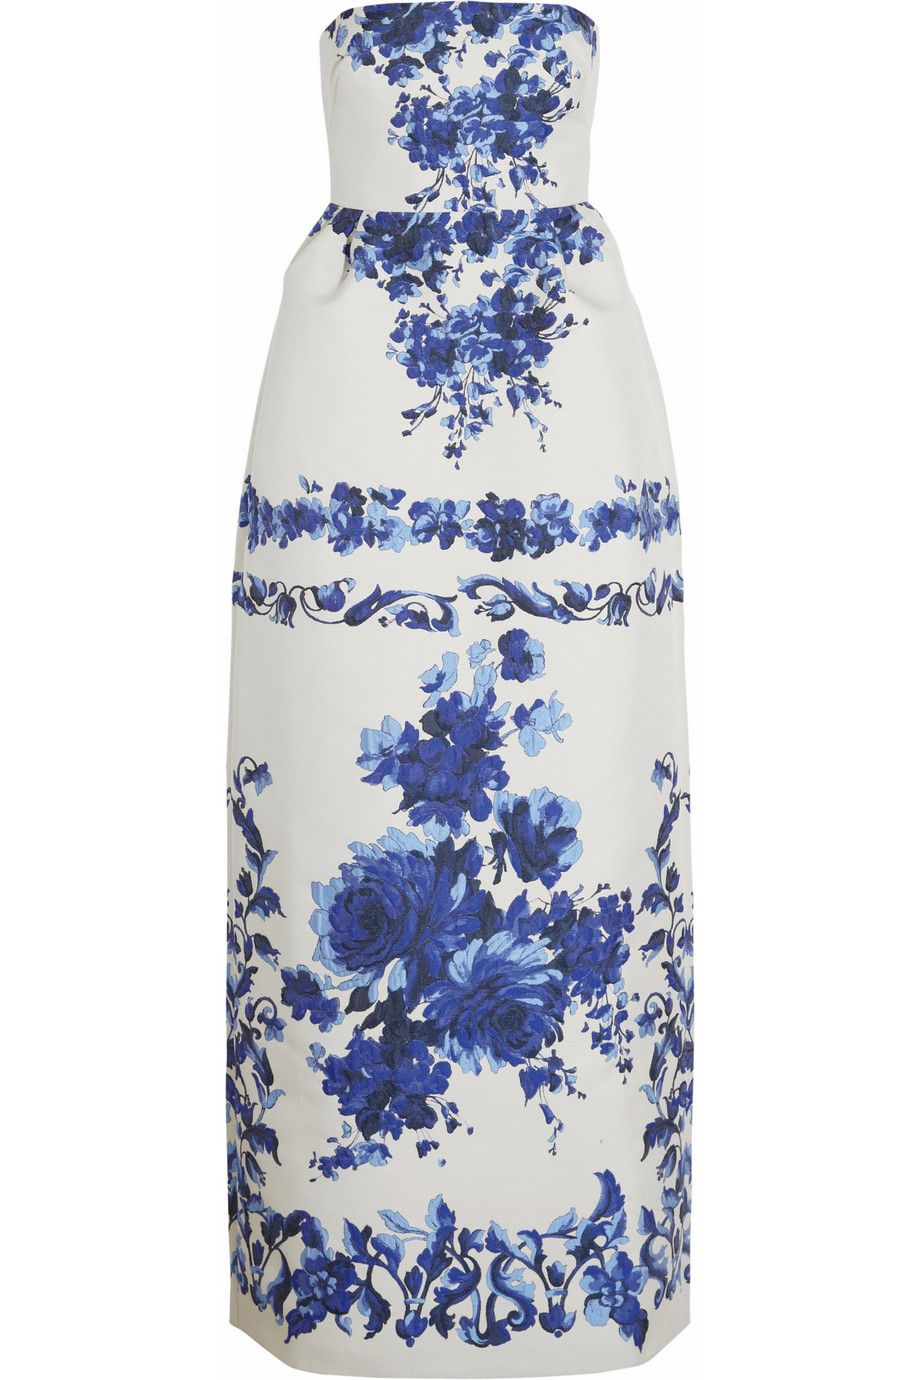 40c61e25806 Valentino | Floral brocade gown | NET-A-PORTER.COM | My style ...